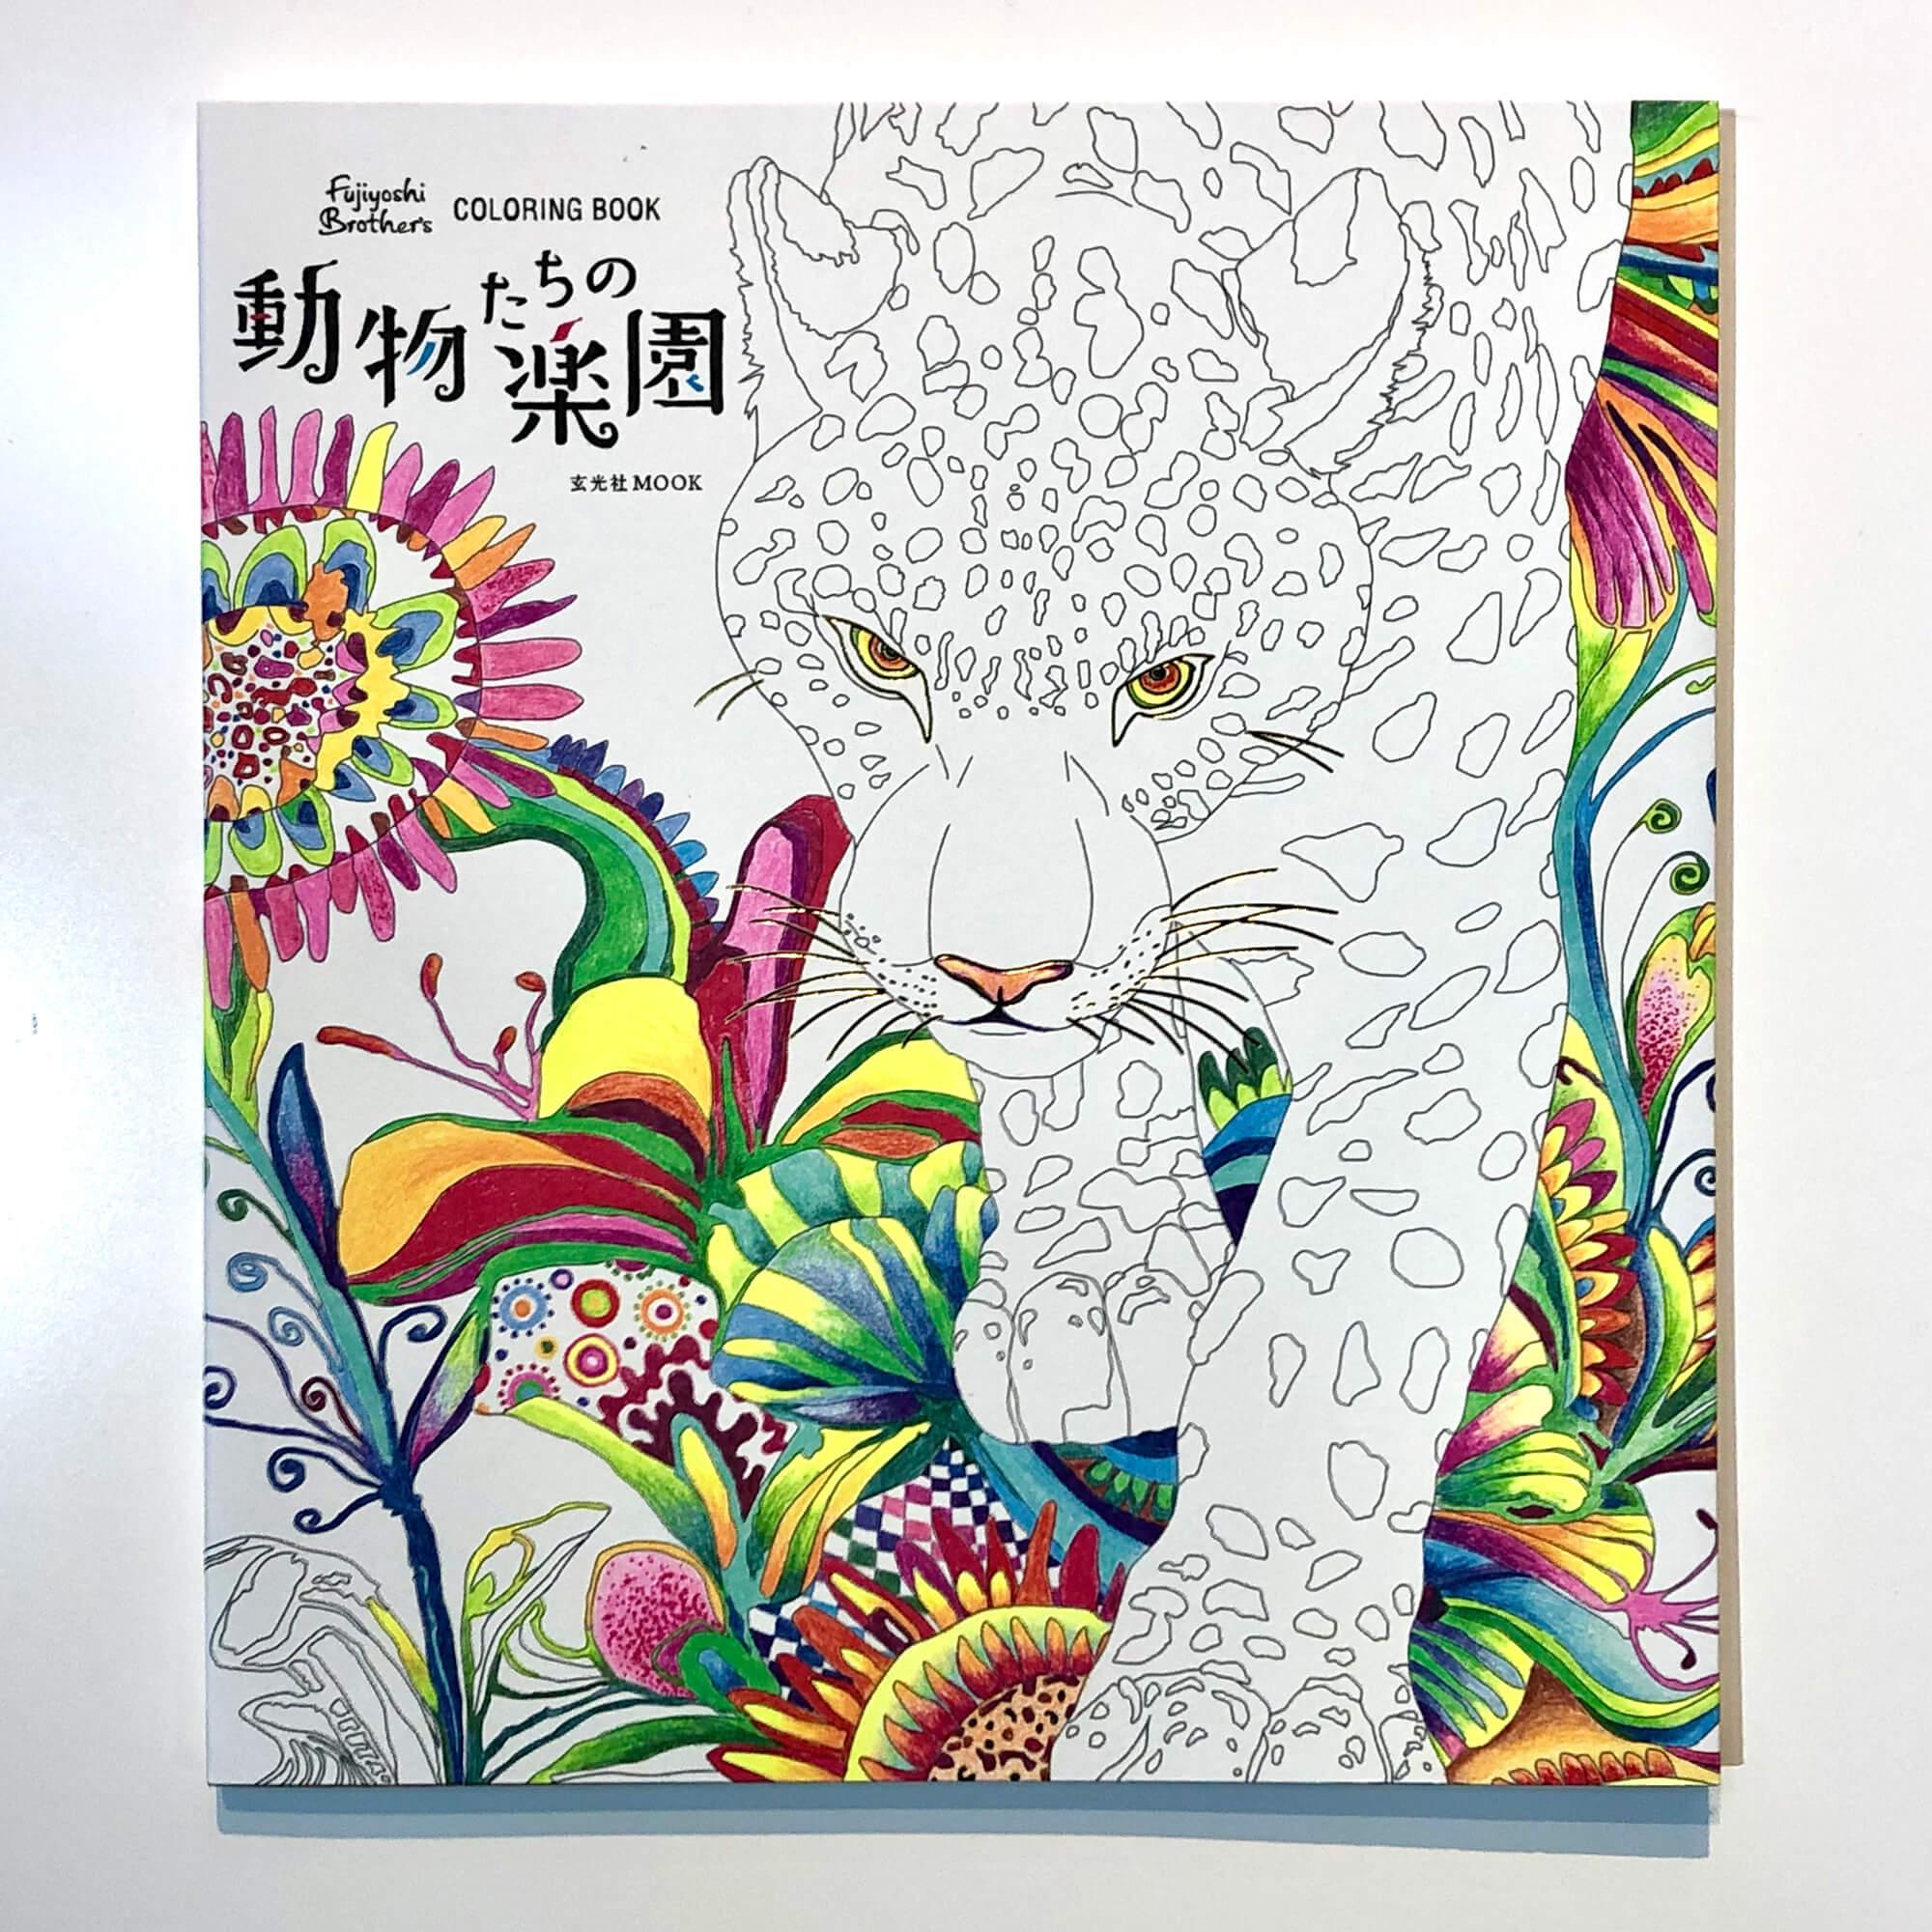 Fujiyoshi Brother's COLORING BOOK 動物たちの楽園(玄光社MOOK), 2015改行 定価¥1,300(税抜)